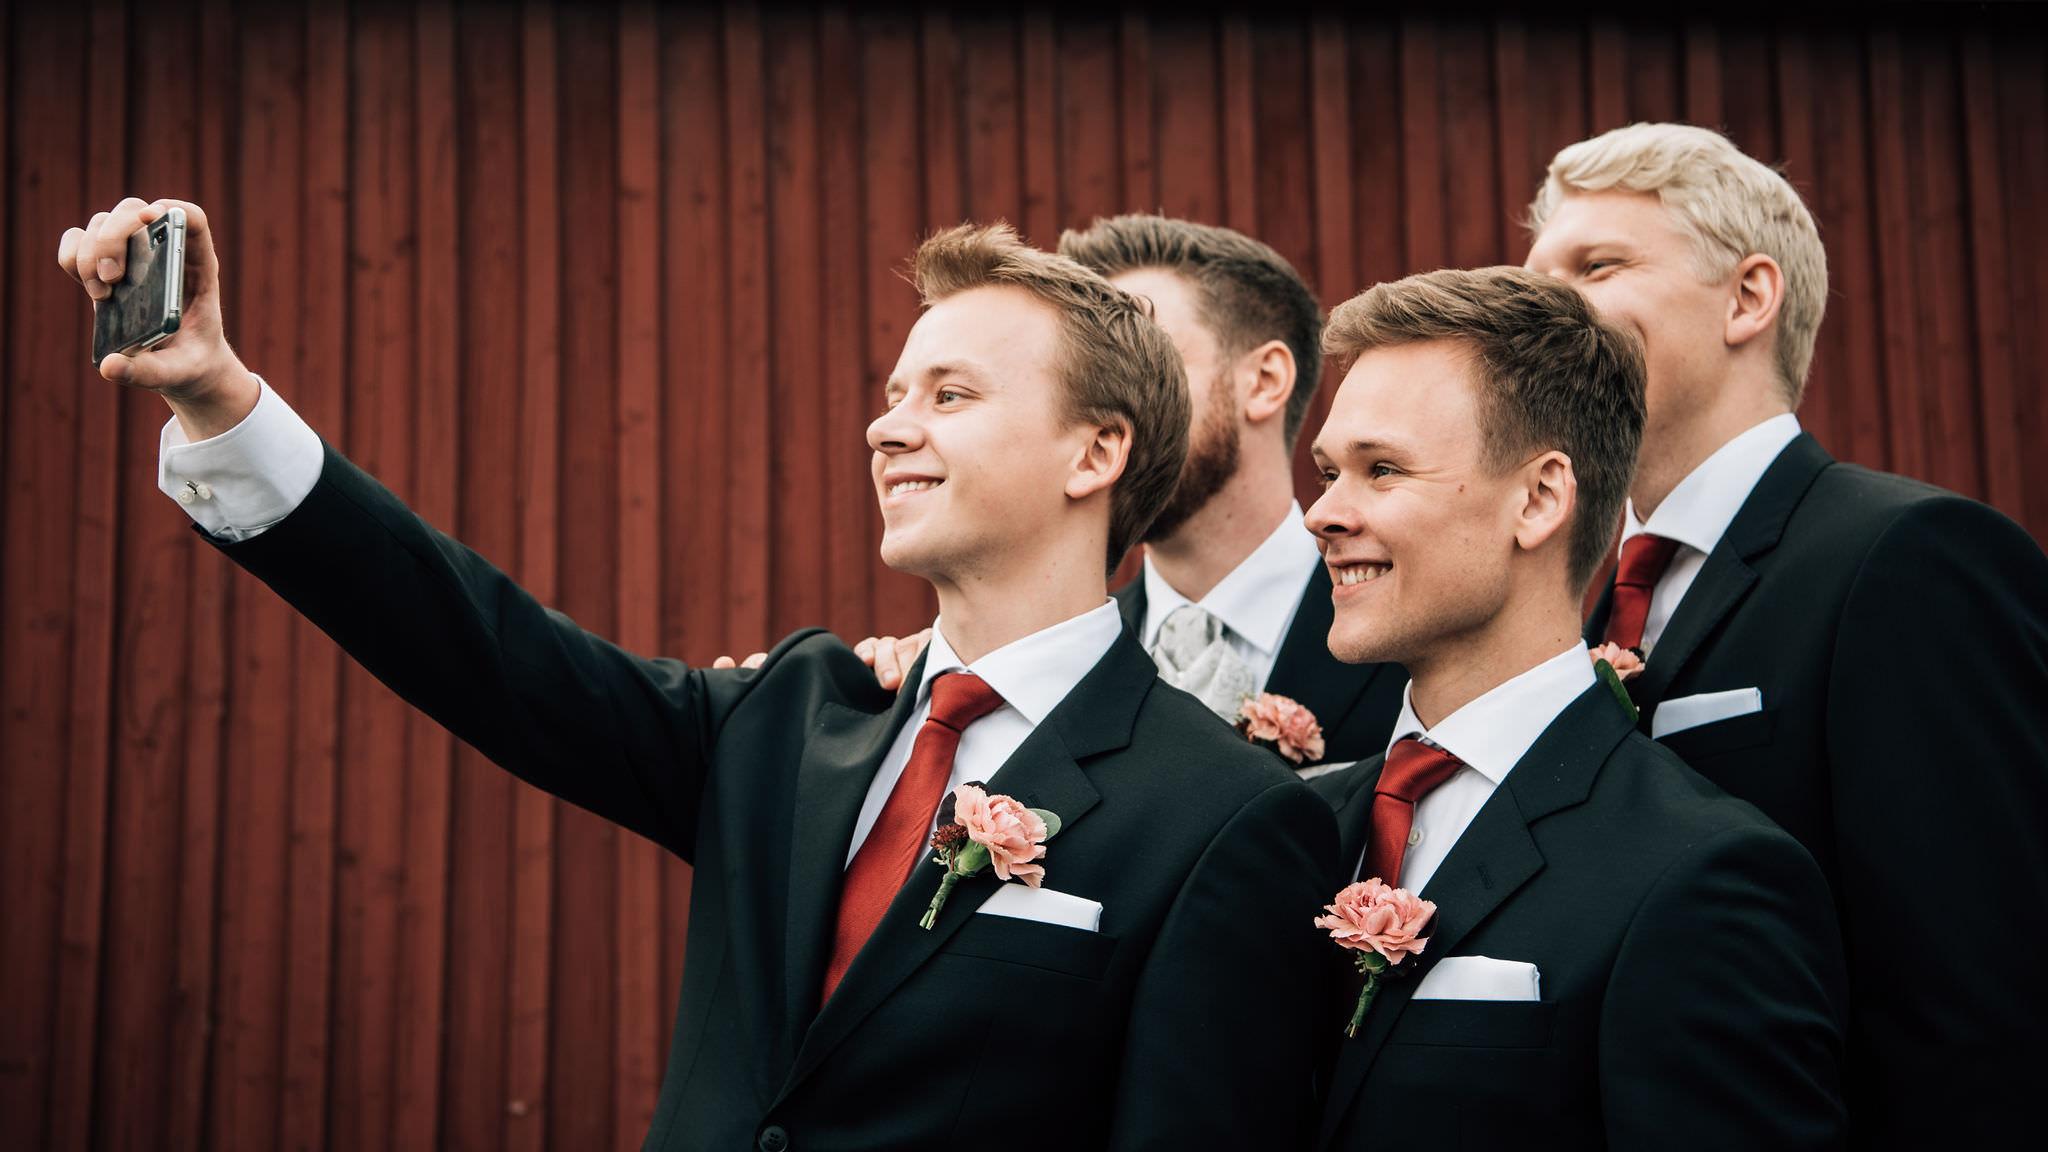 750_0216_fotografering_larvik_bryllup_aspargesgarden_.jpg